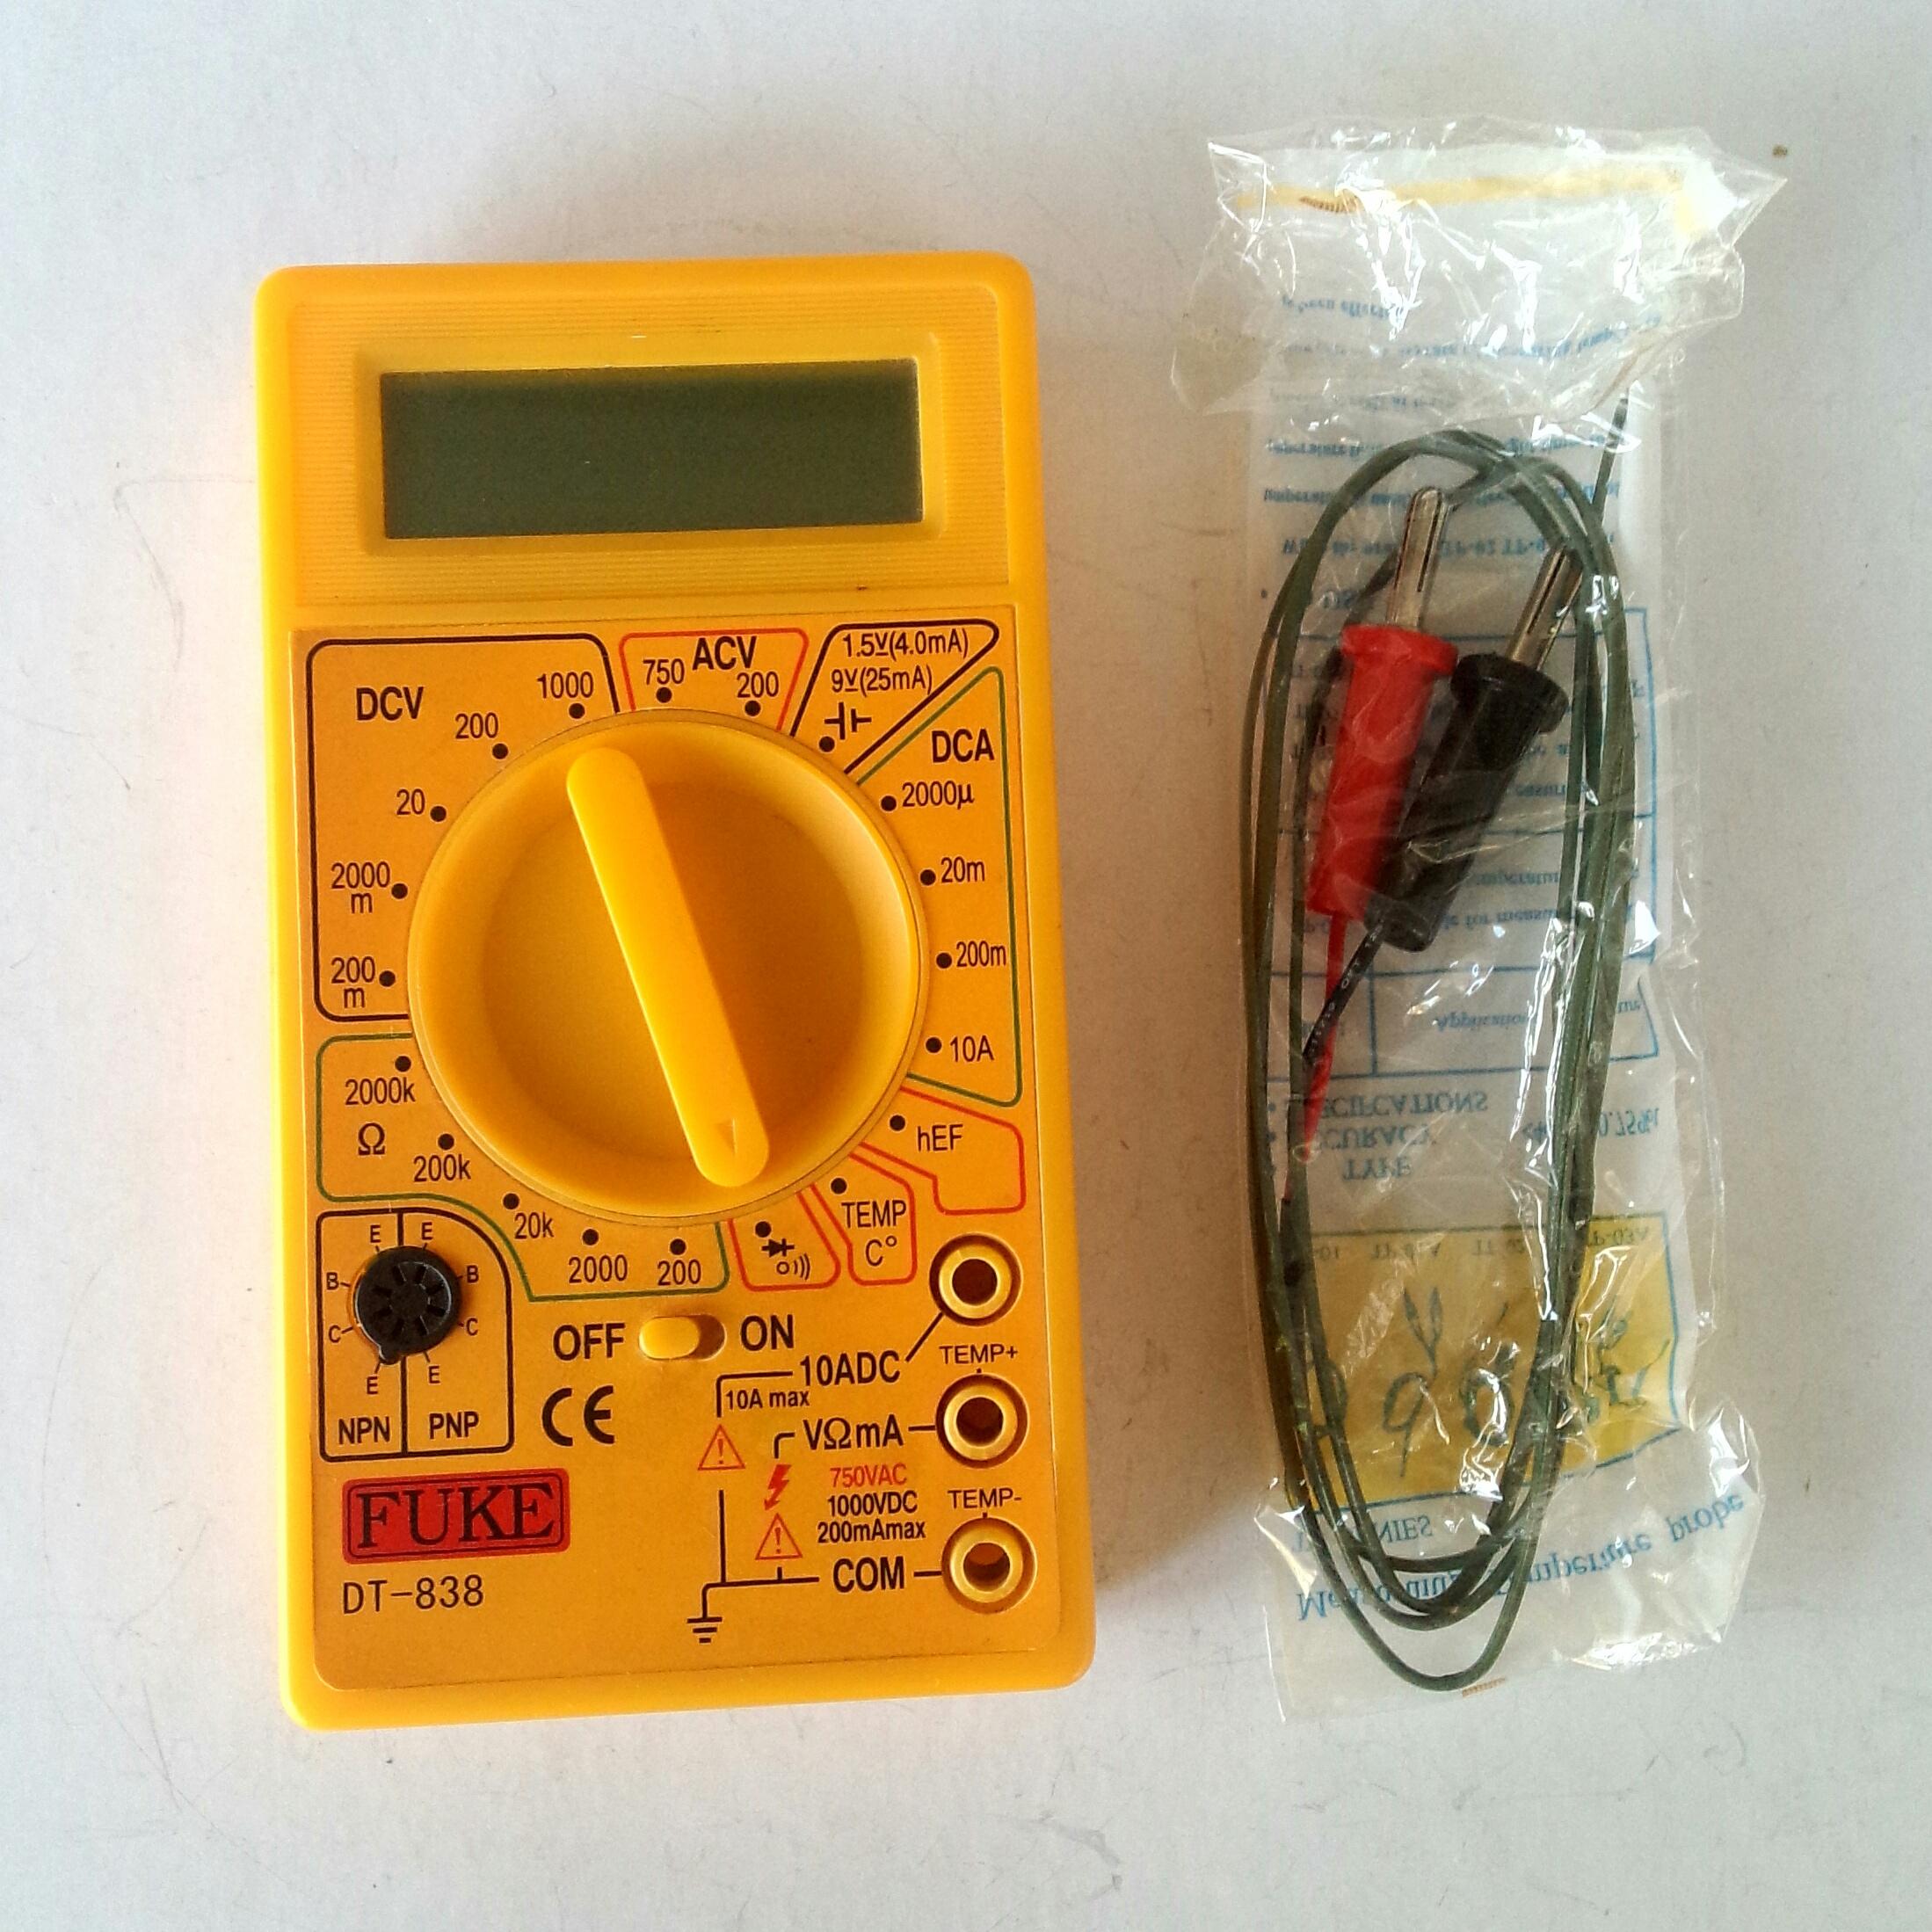 Мультиметр DT-838 FUKE выключатель, термопара